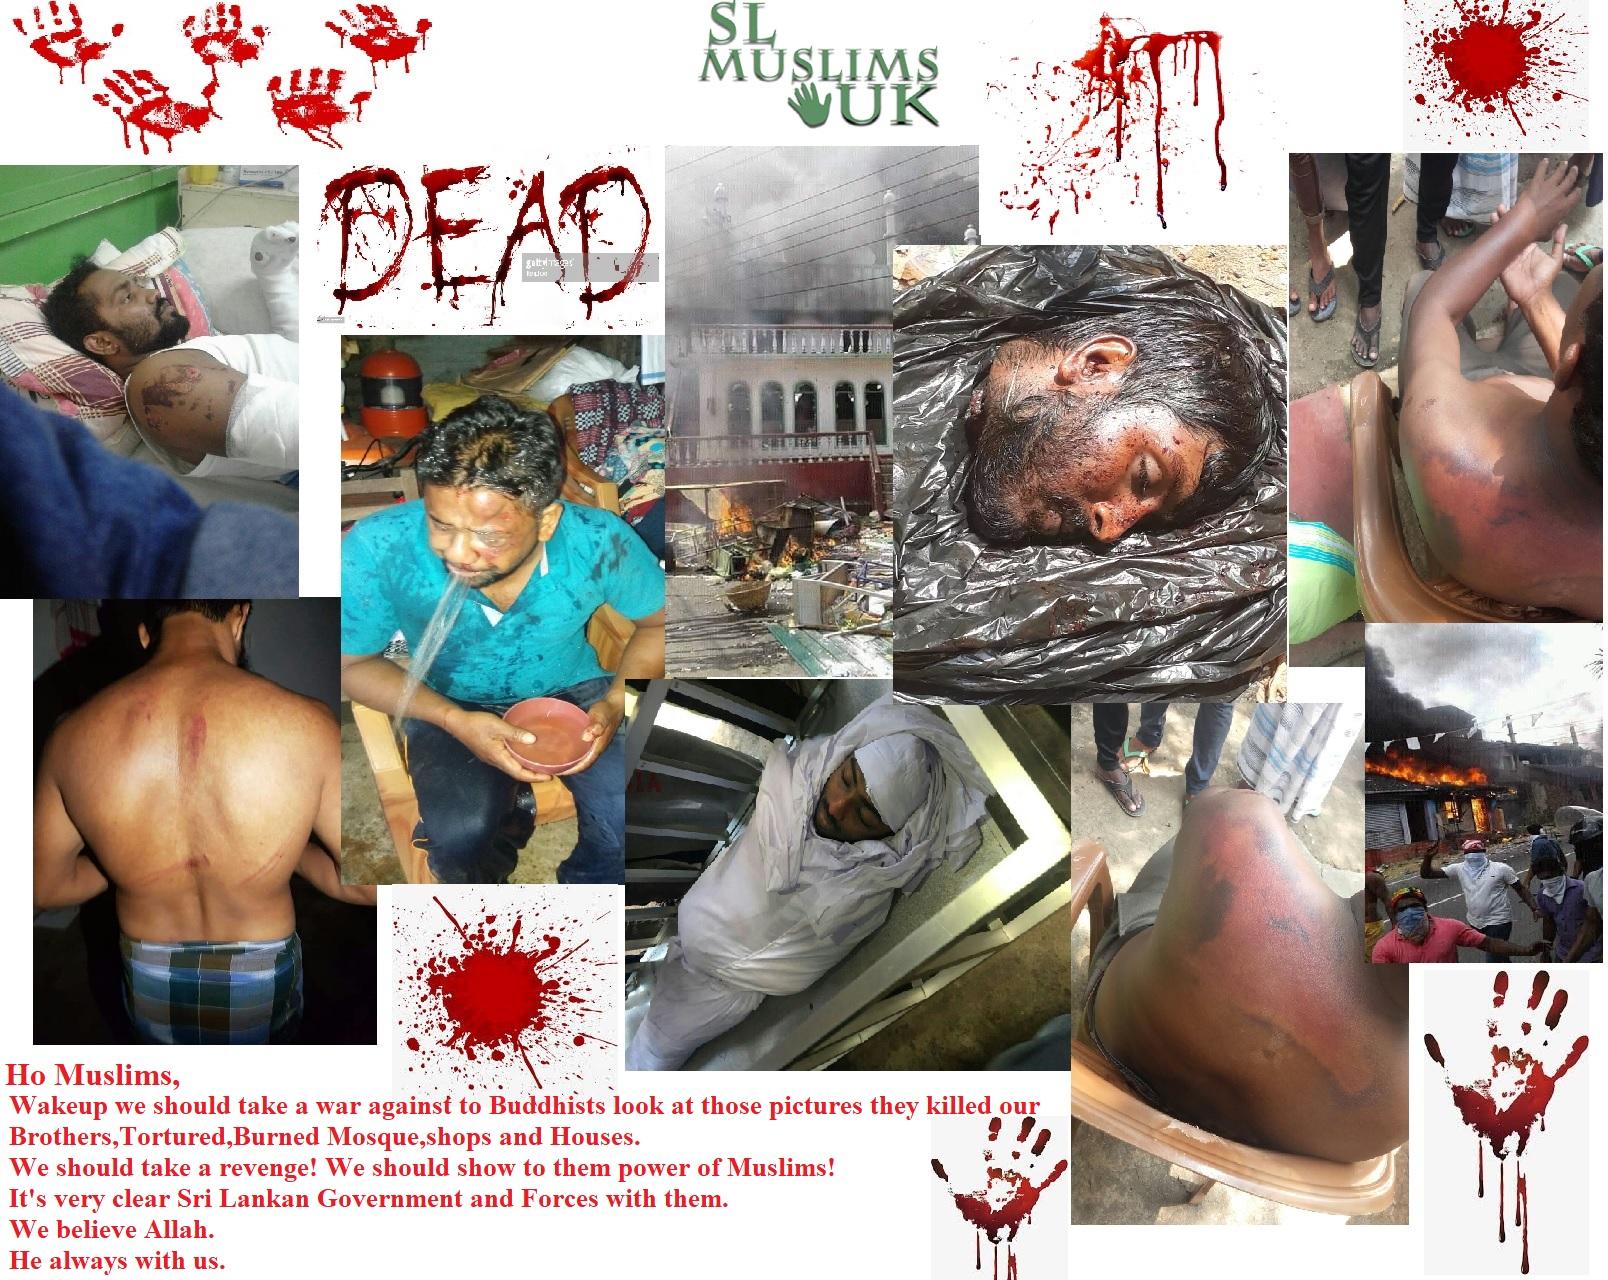 War against to Sri Lankan Buddhists